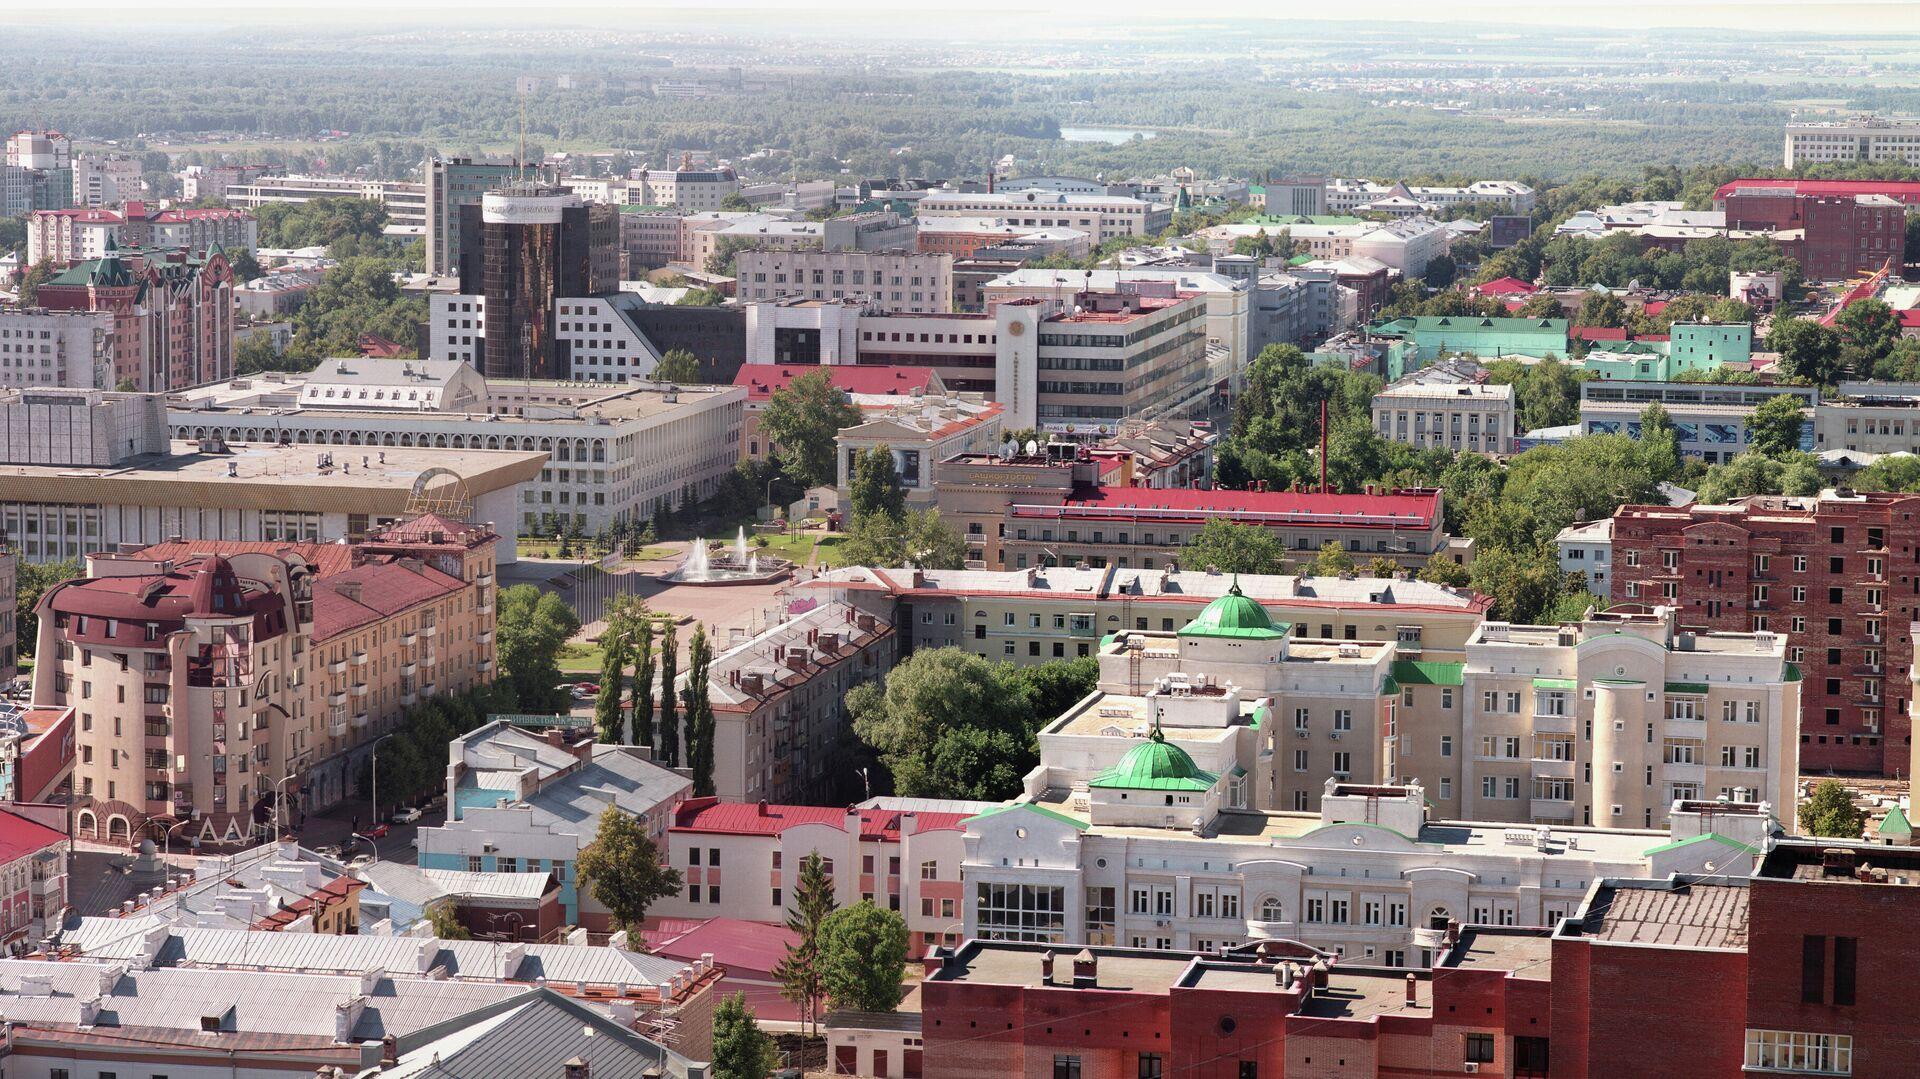 Вид на город Уфа - РИА Новости, 1920, 08.05.2021